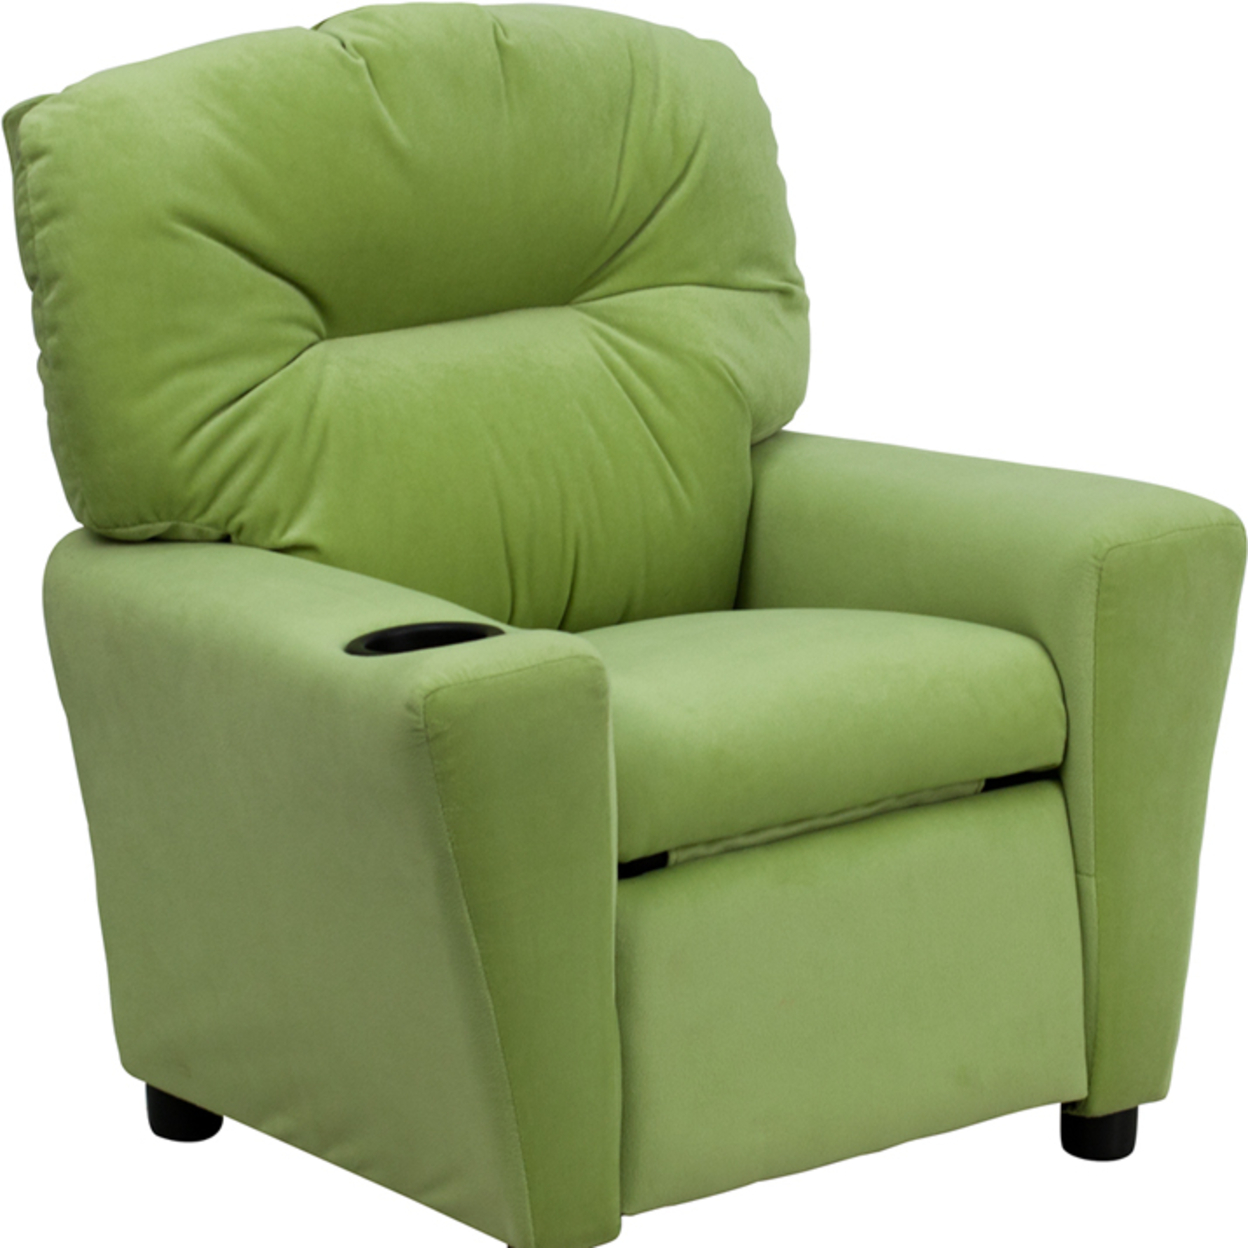 Flash Furniture Contemporary Avocado Microfiber Kids Recliner with Cup Holder [863-Bt-7950-Kid-Mic-Avo-Gg] 59e46011e224613cc0691999